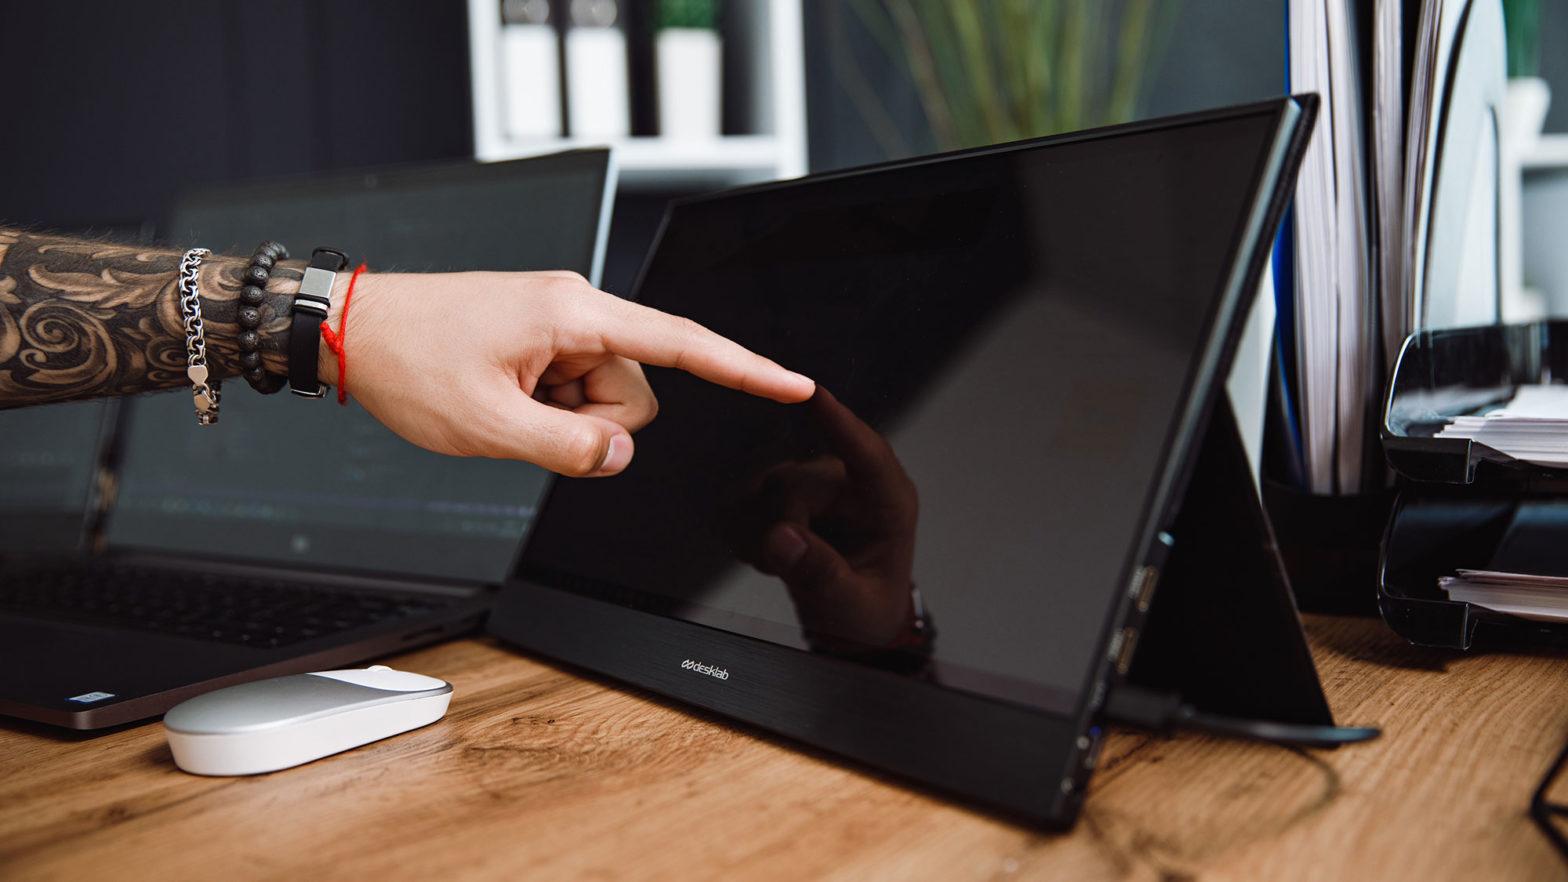 DeskLab Portable 4K Touchscreen Monitor